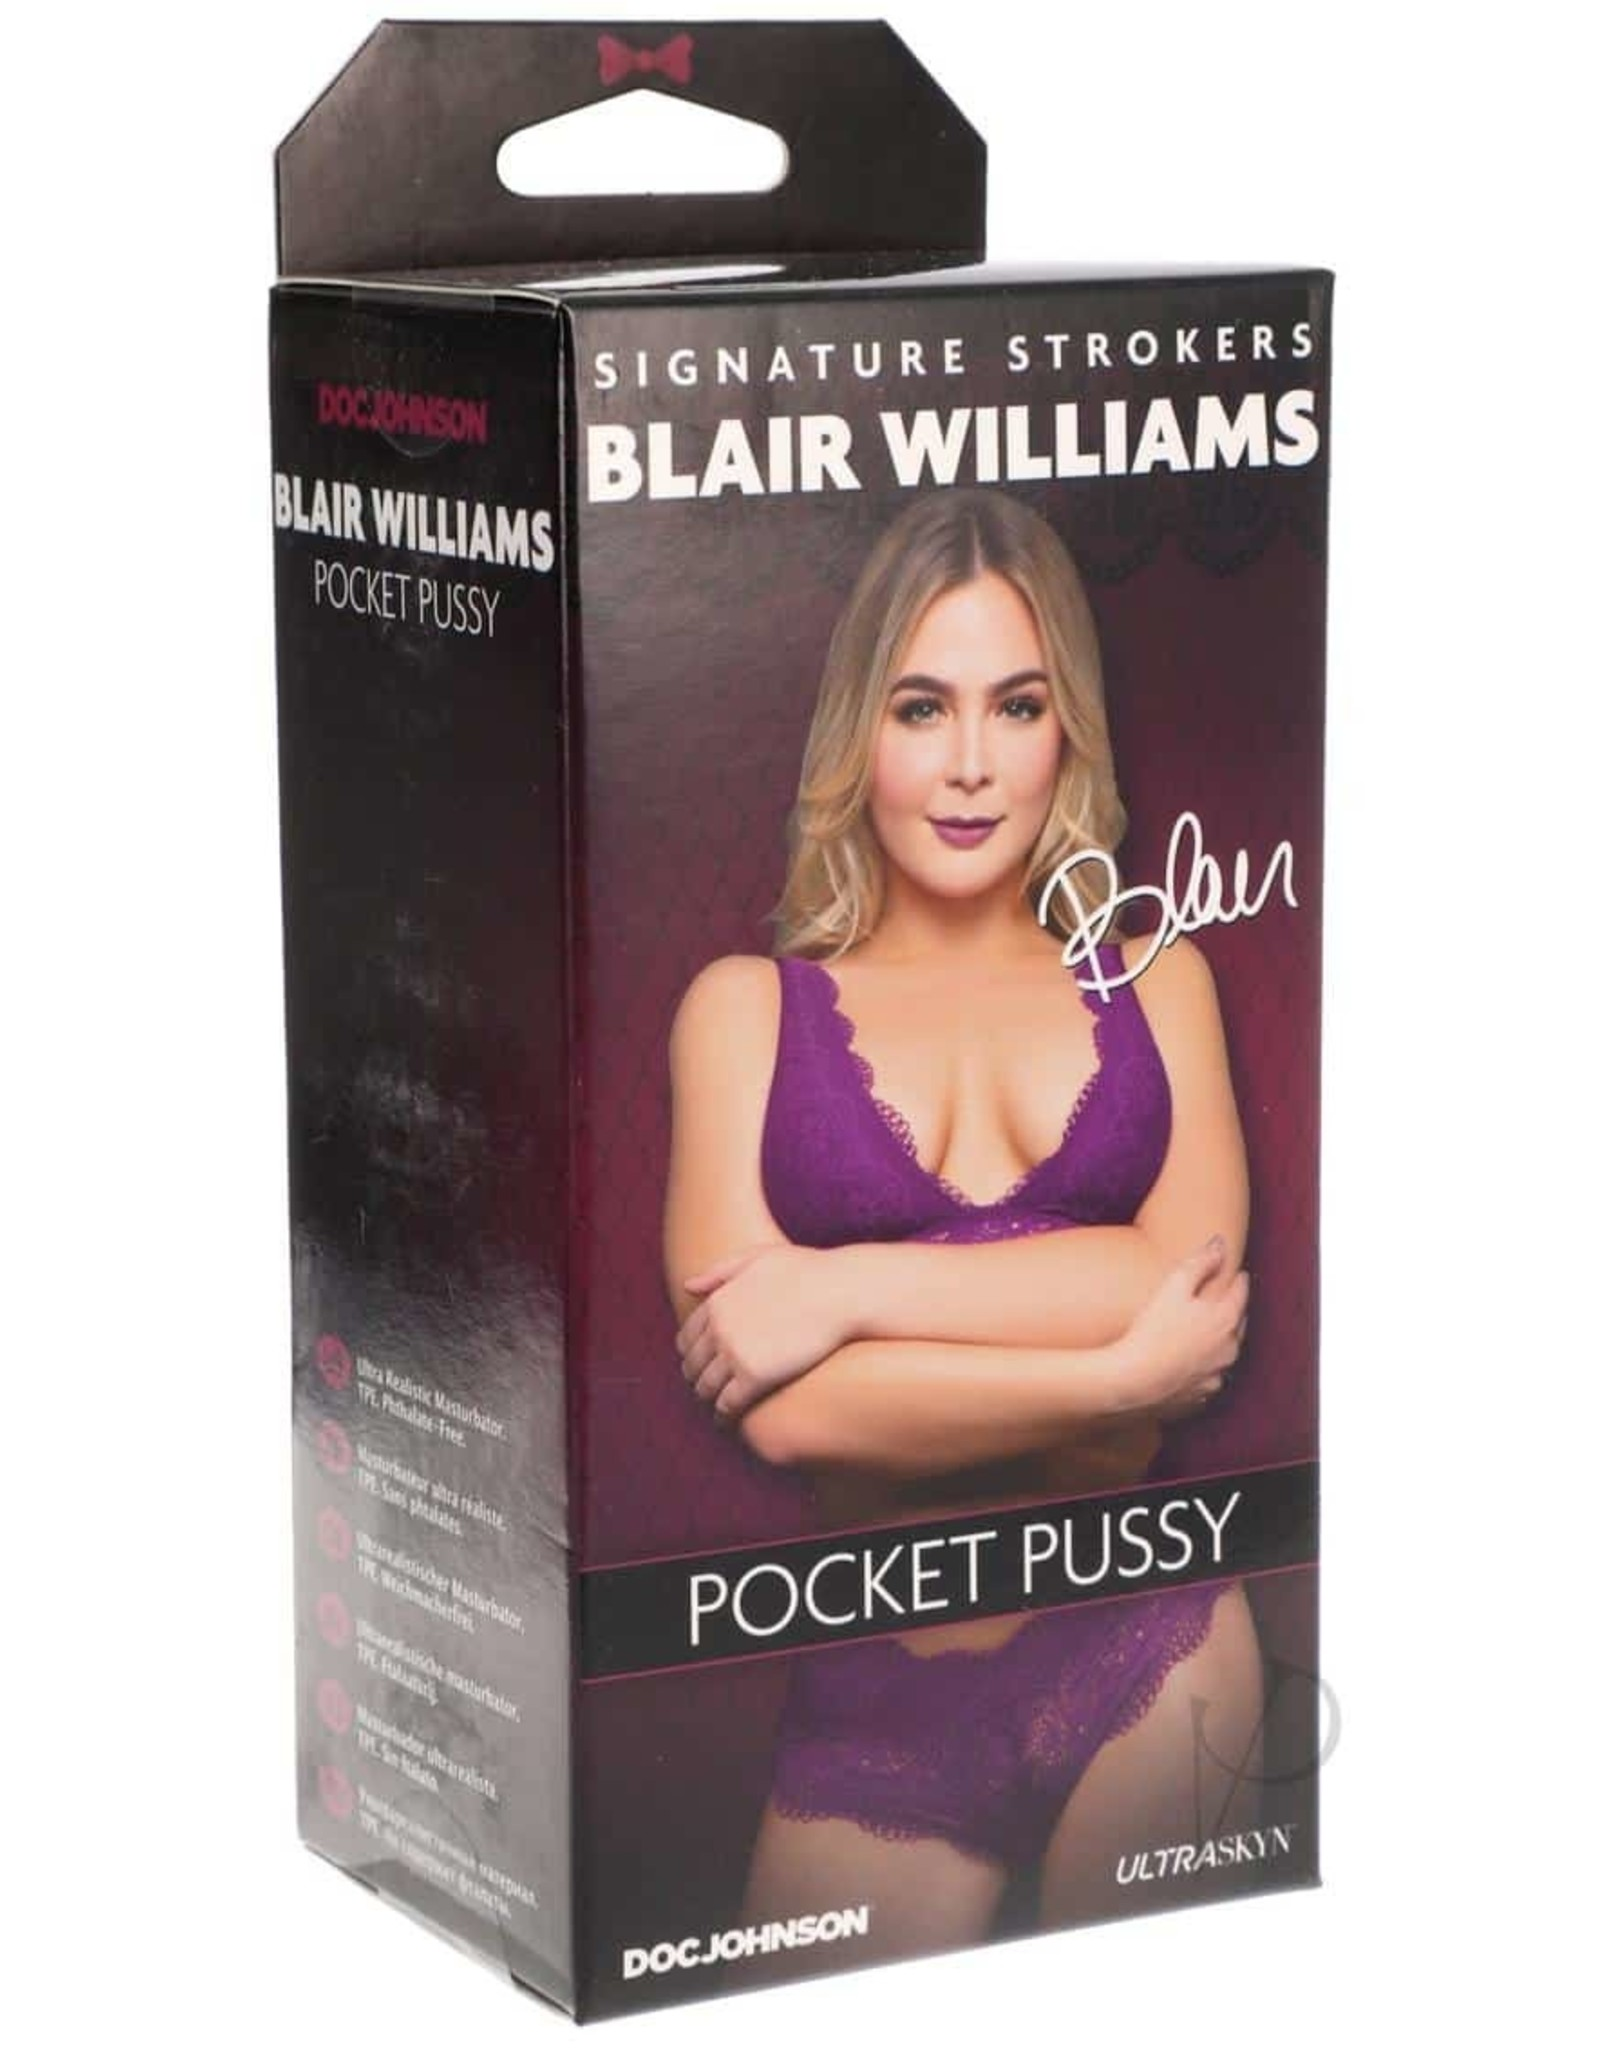 BLAIR WILLIAMS ULTRASKYN POCKET PUSSY